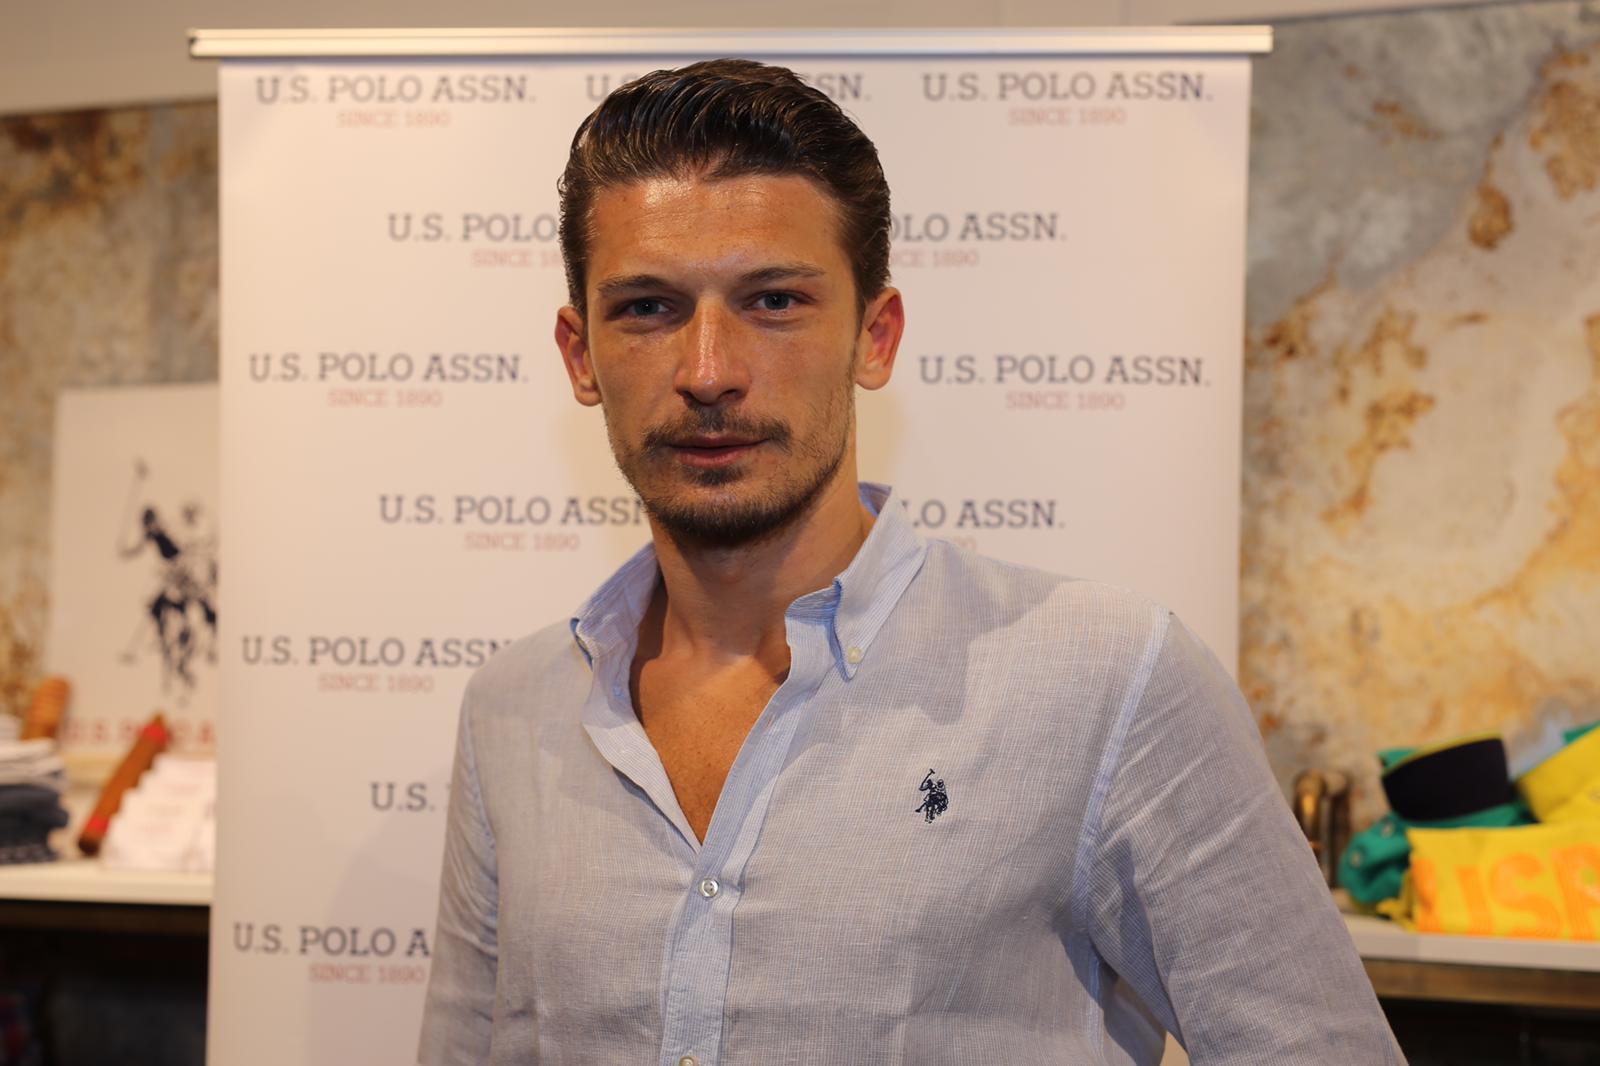 U.S. Polo Assn primavera estate 2020